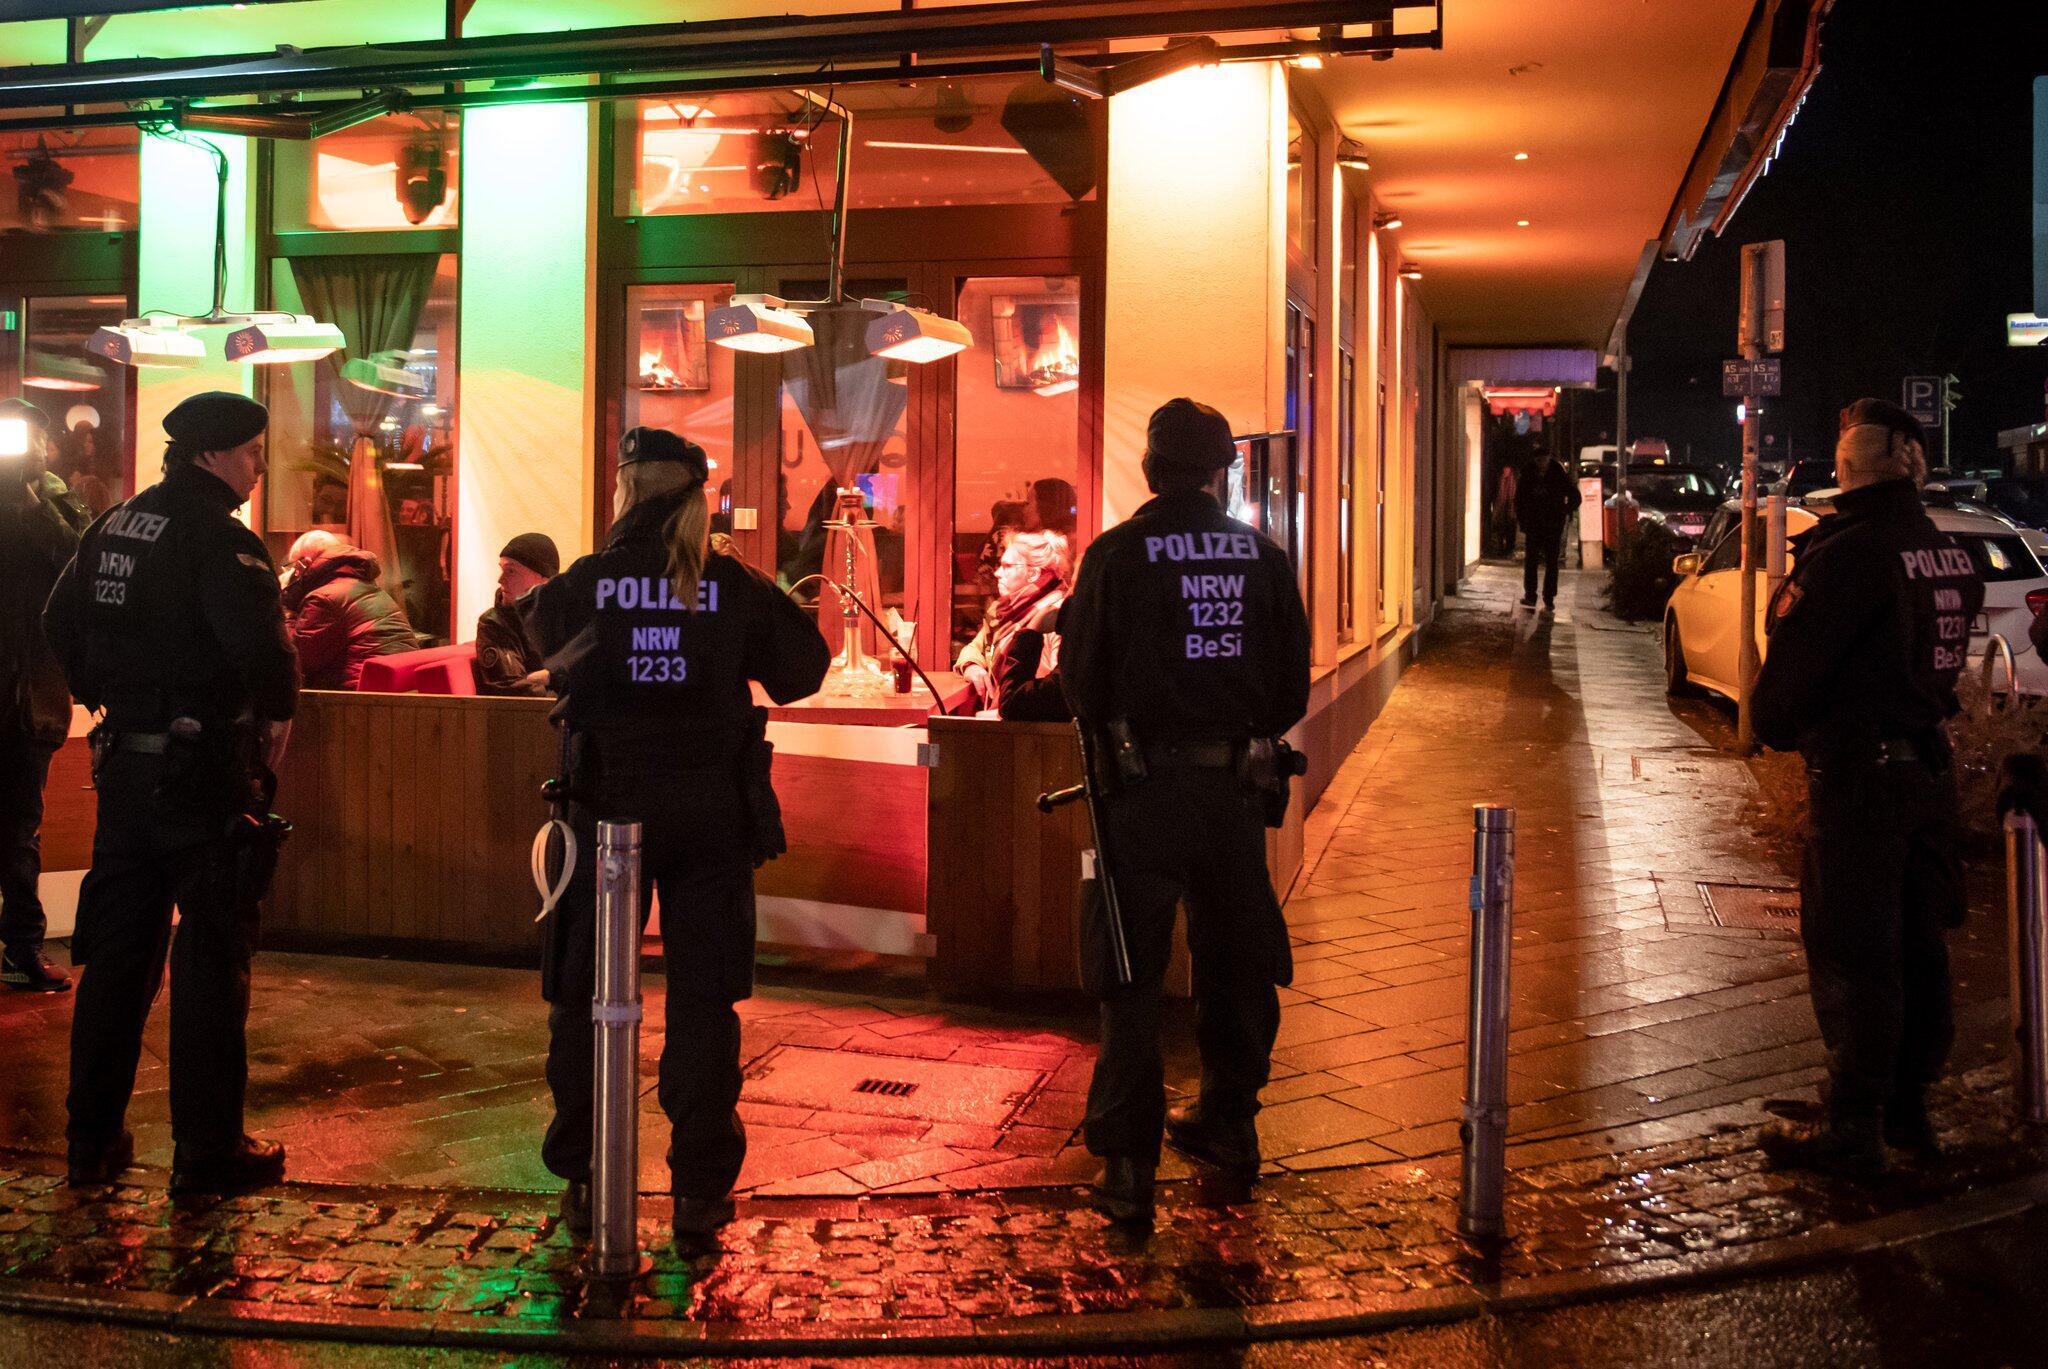 Bild zu Razzien in mehreren Shisha-Bars in NRW